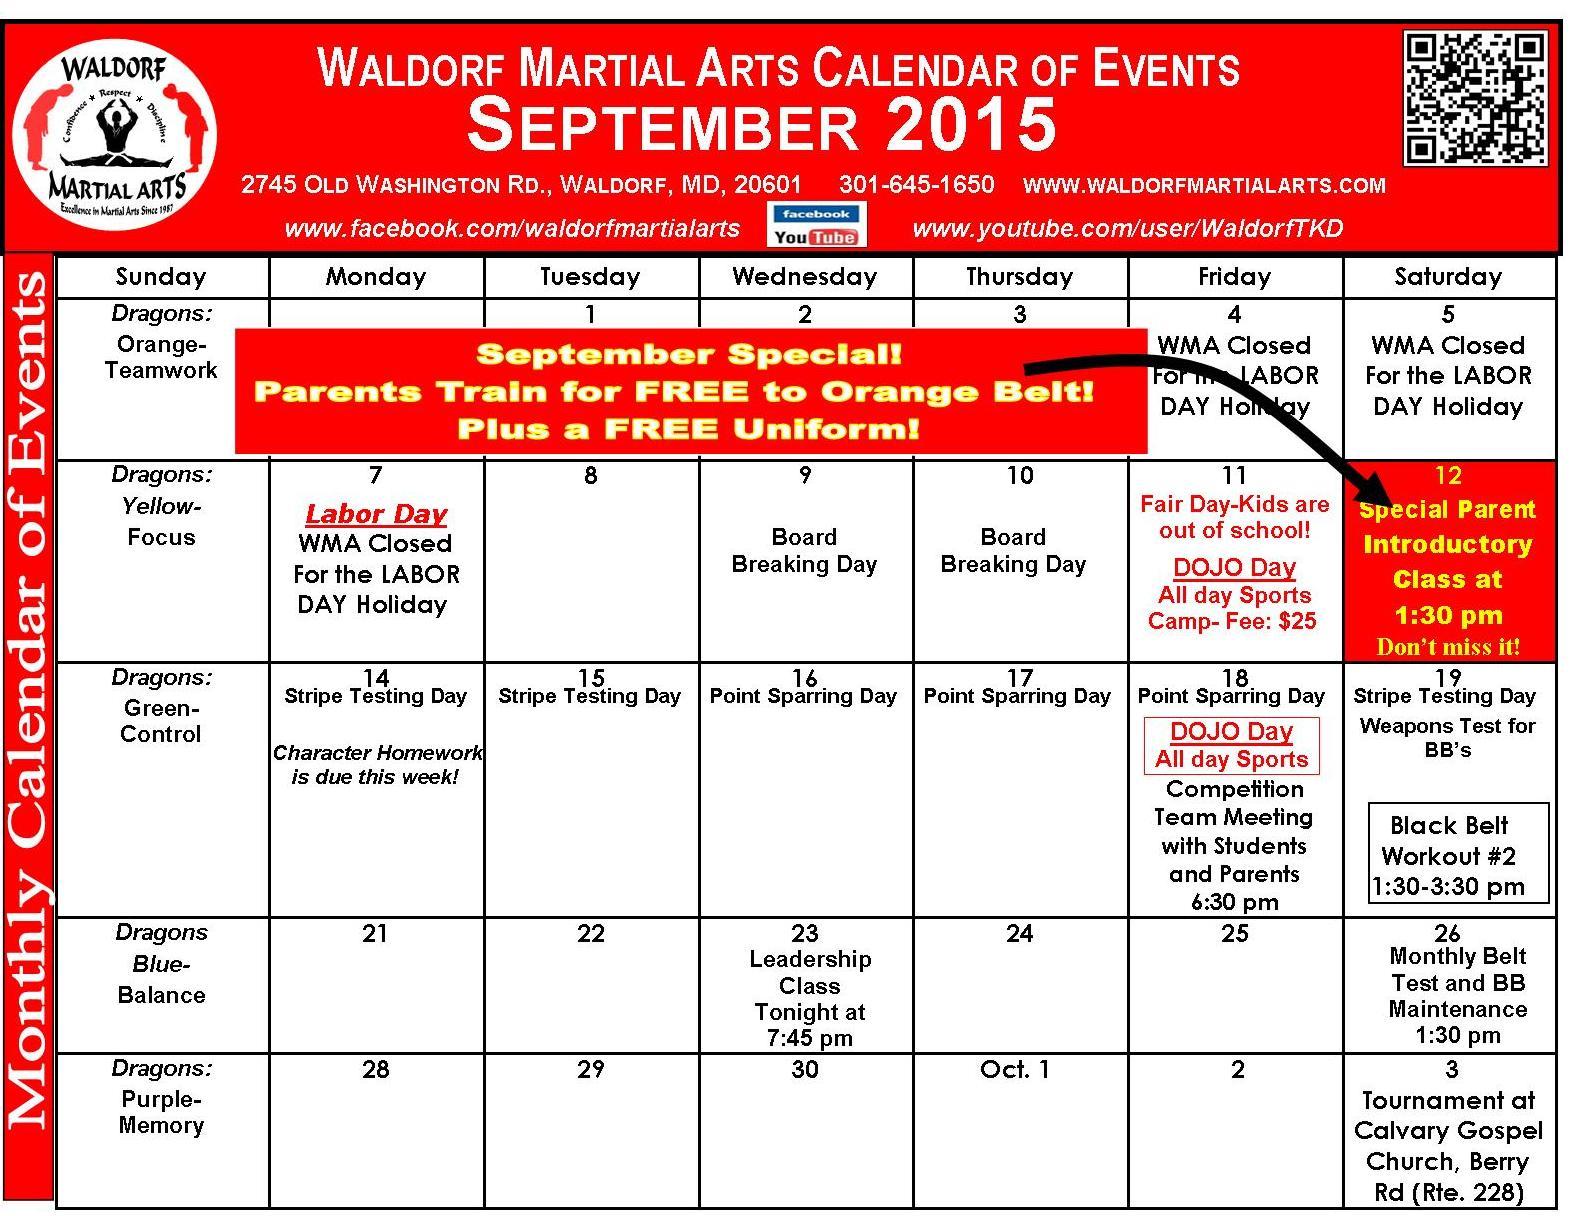 Sept 2015 Calendar of Events